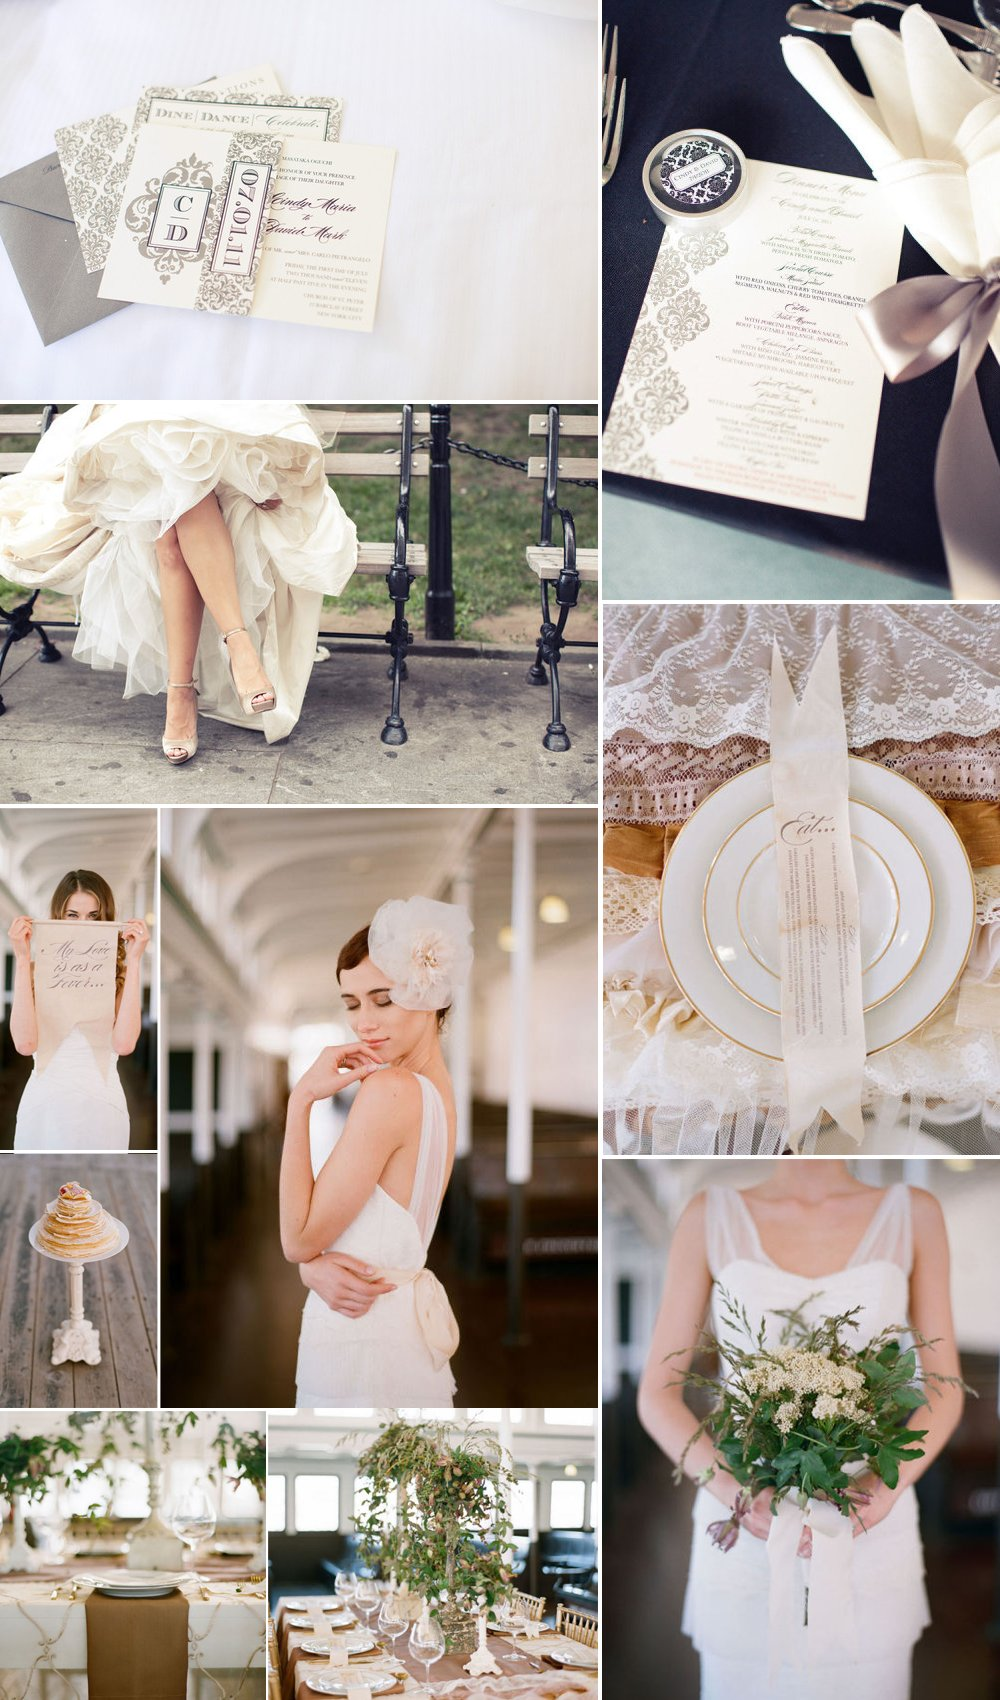 Elegant-wedding-colors-neutrals-tans-ivory-cream-blush-romantic-bridal-style.full